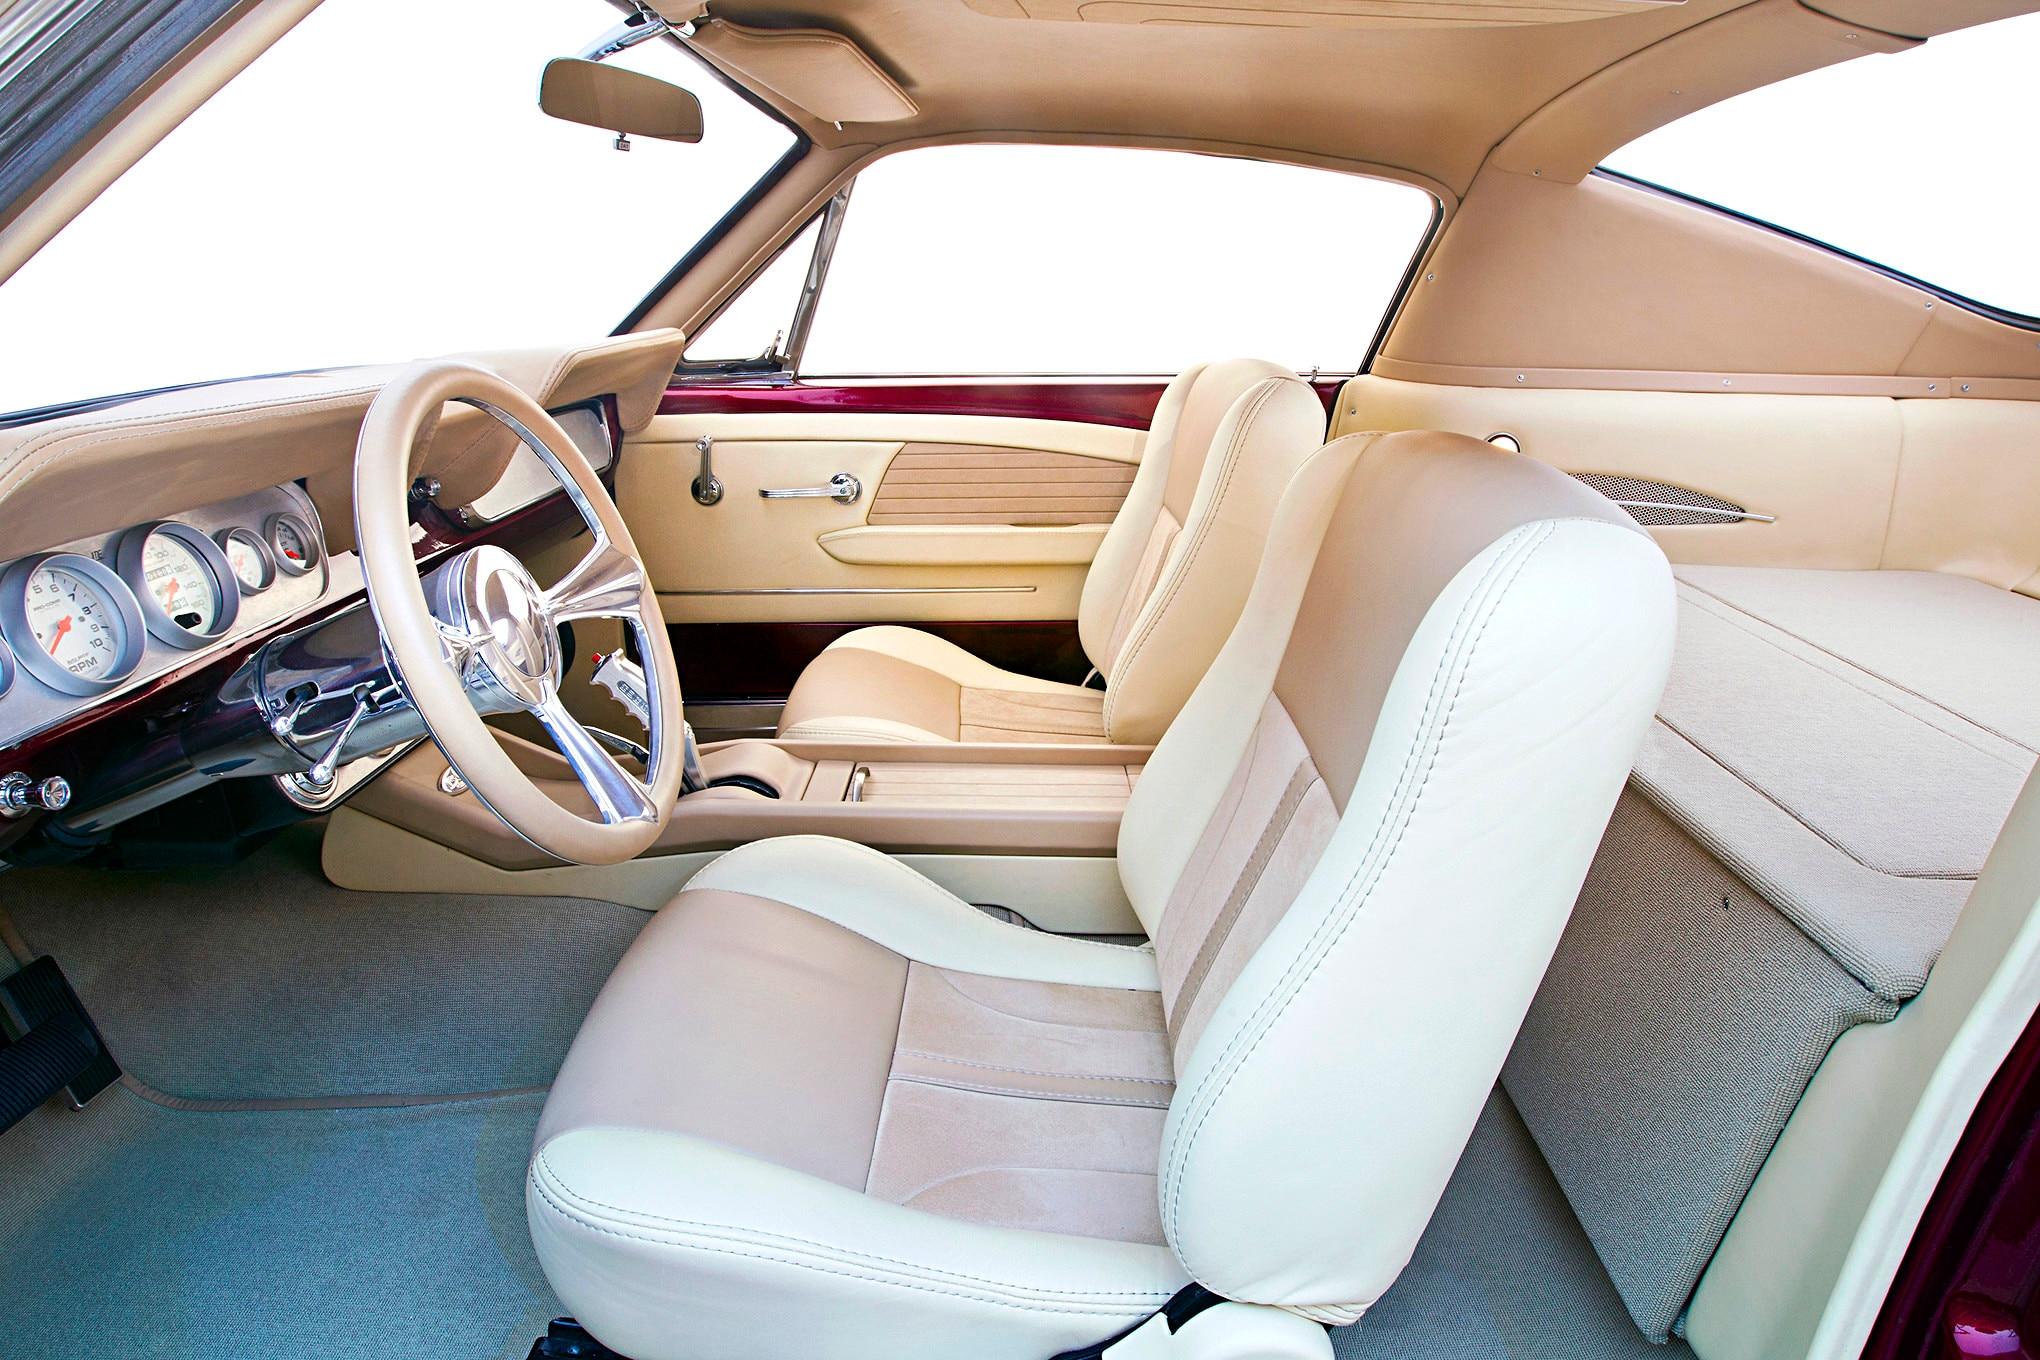 023 1966 Mustang Interior